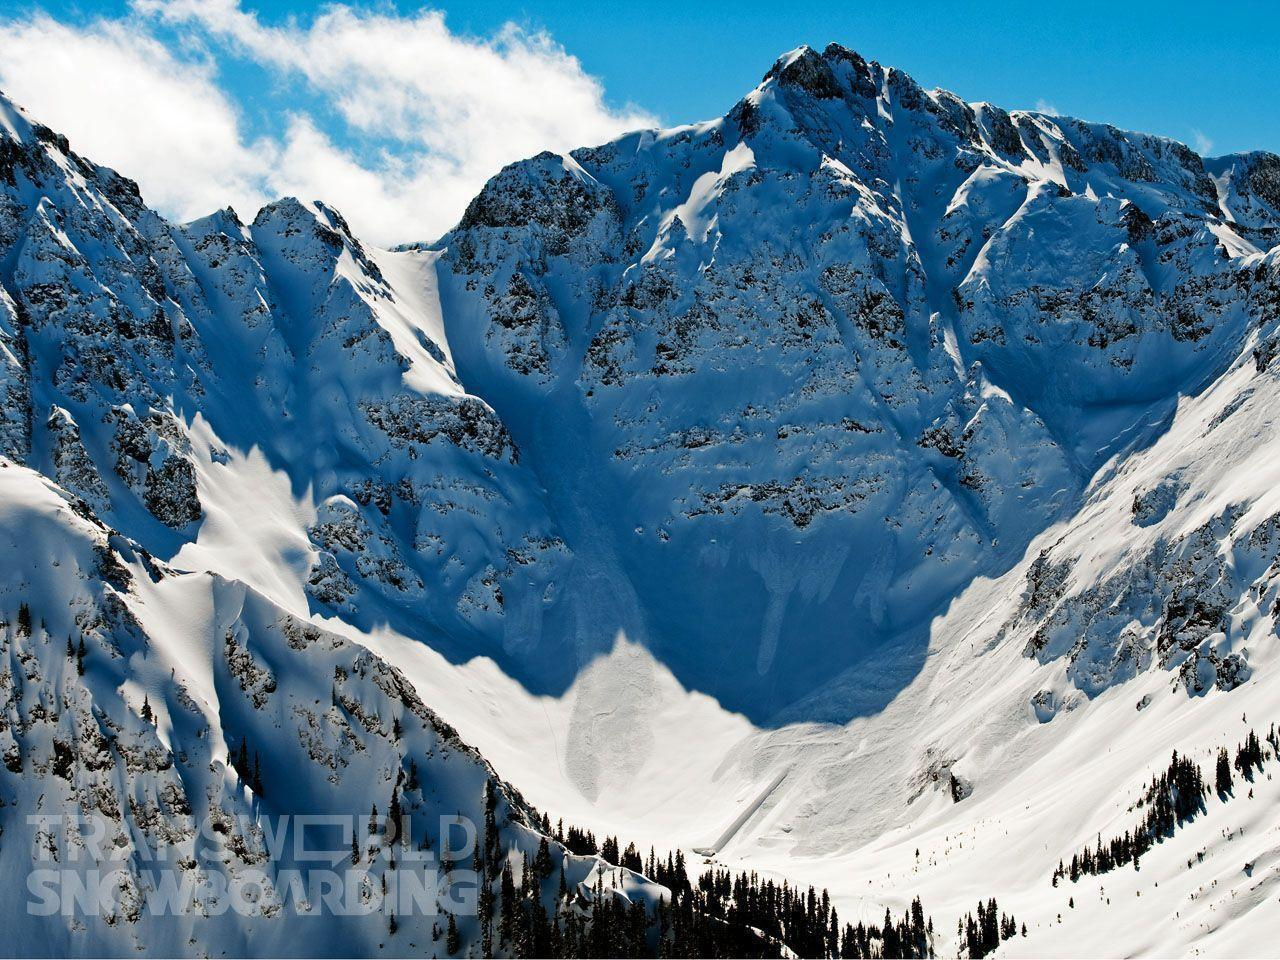 Snowboarding Desktop Backgrounds